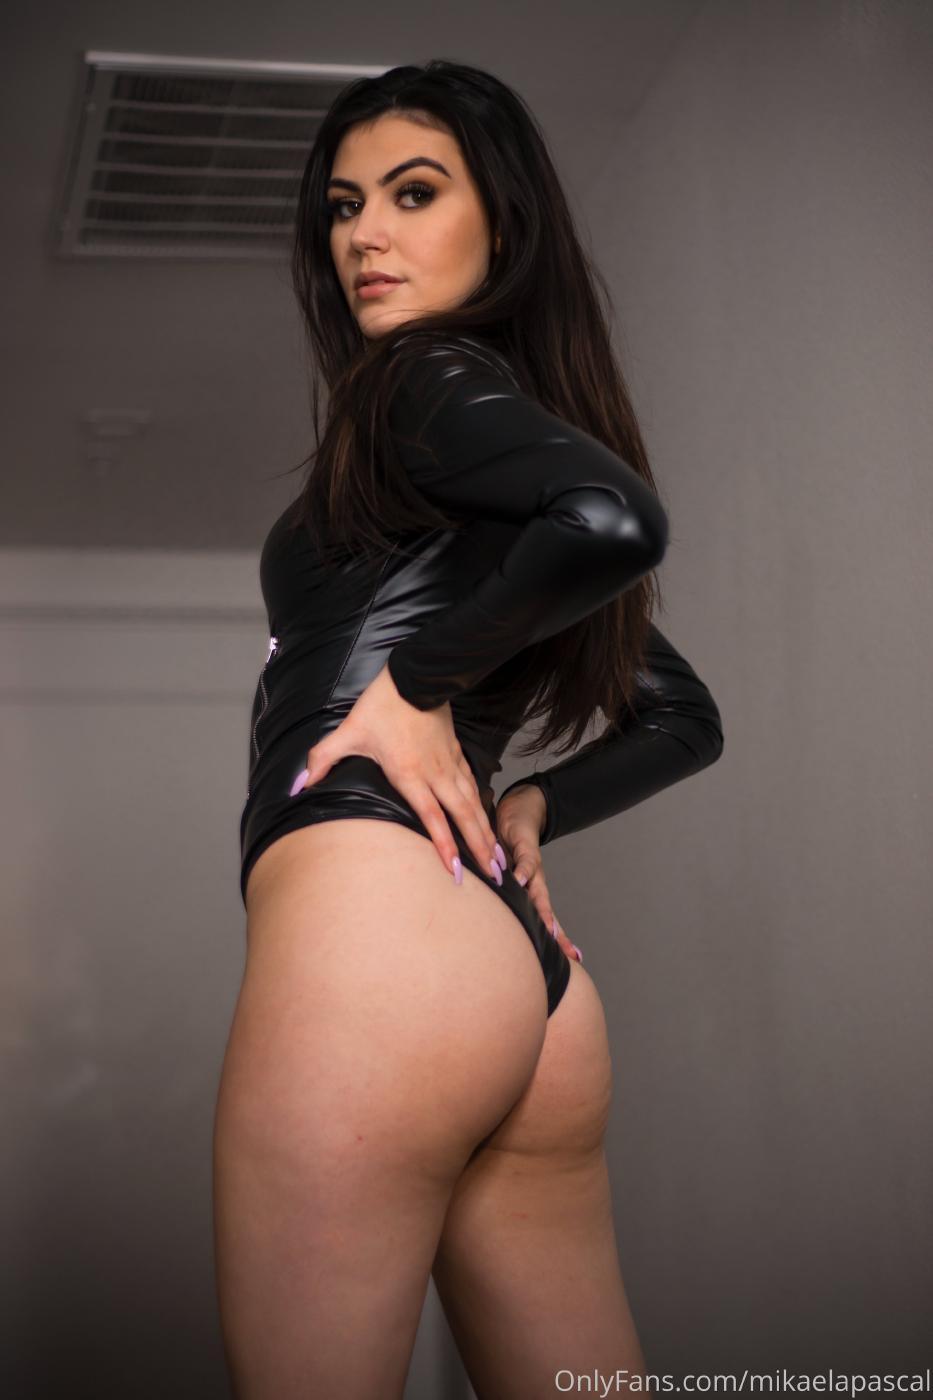 Mikaela Pascal Sexy Leather Bodysuit Onlyfans Set Leaked 0012